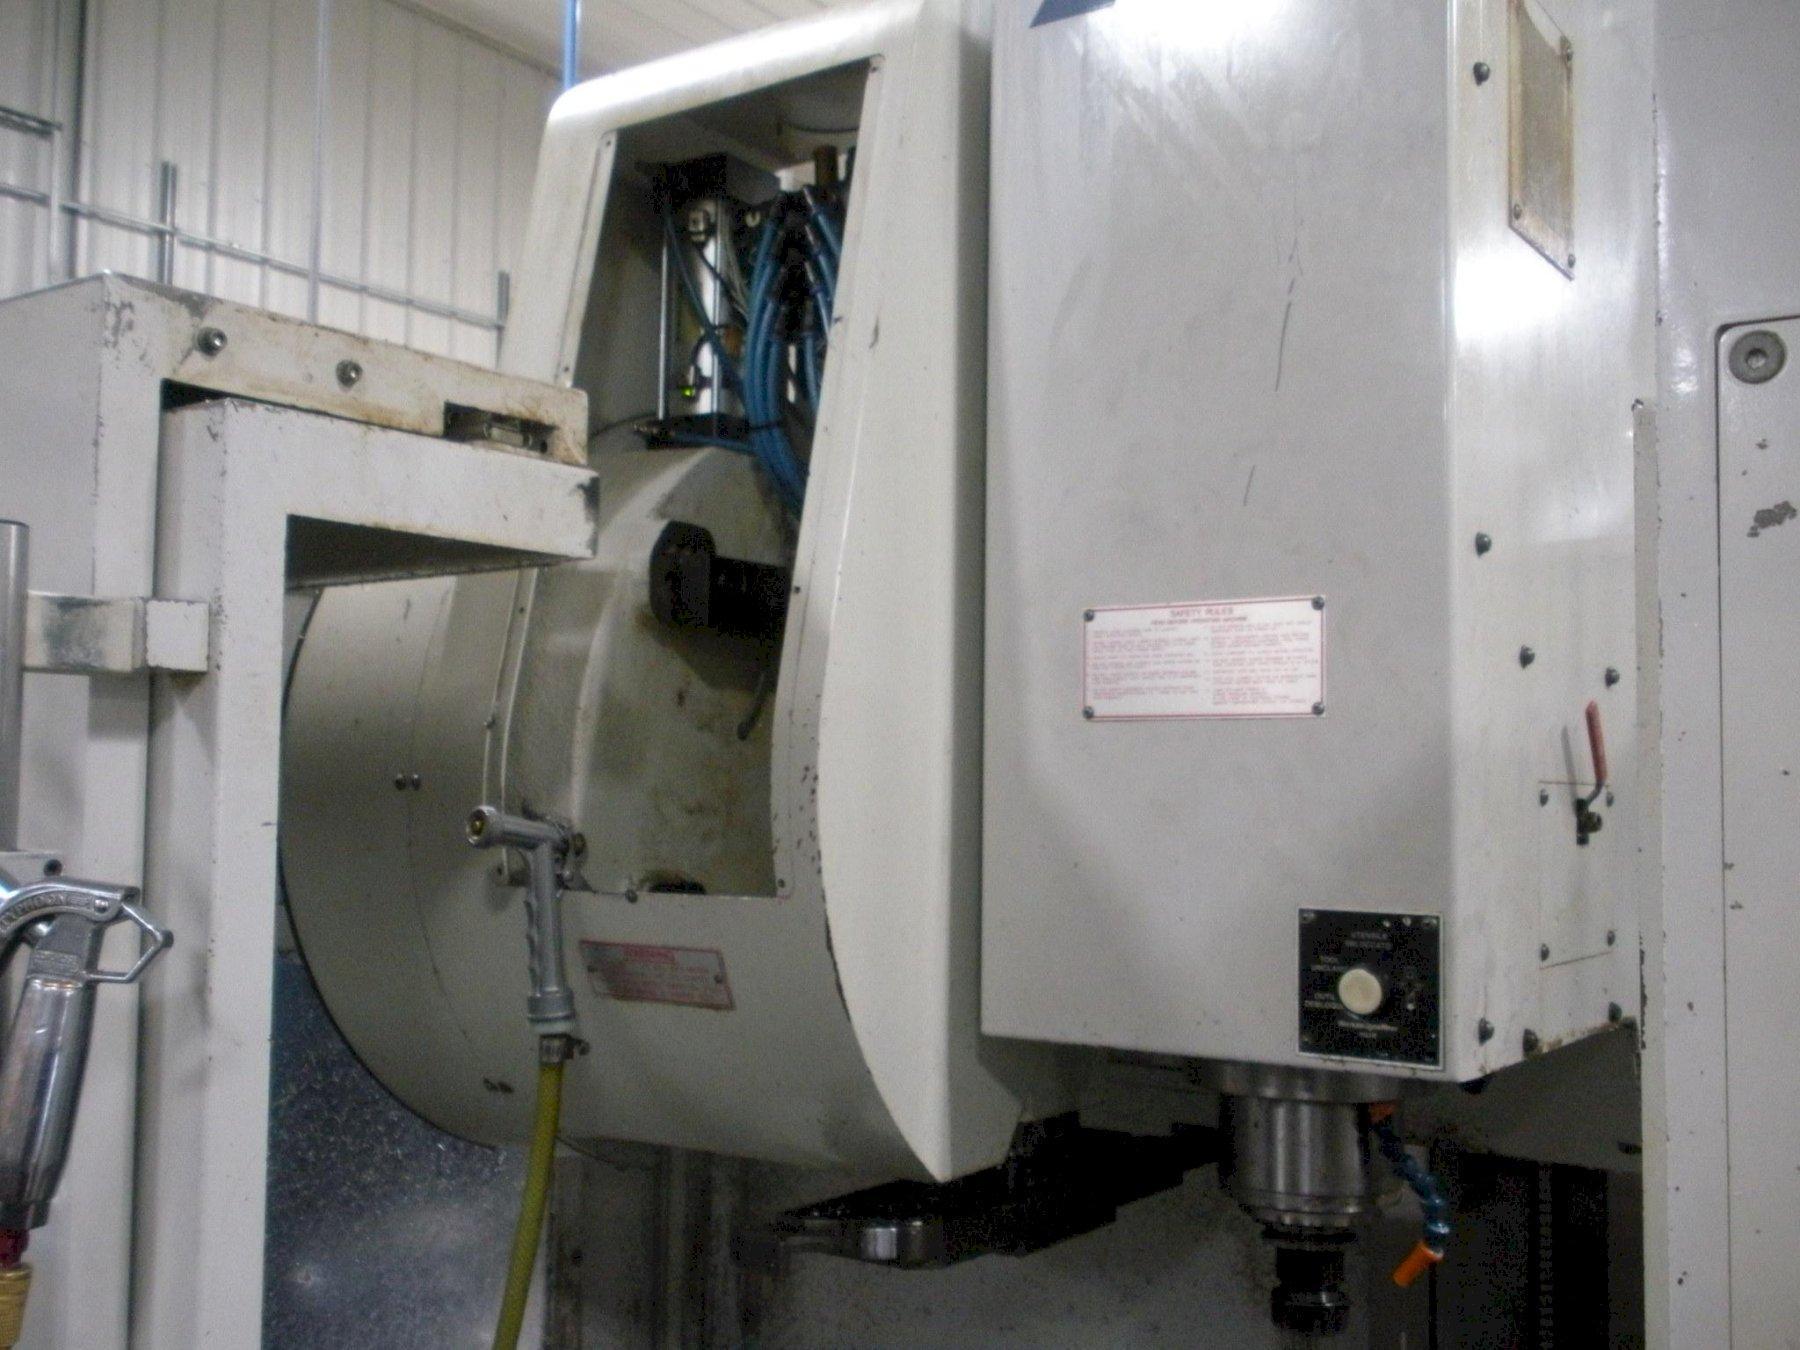 Milltronics RW18 Vertical Machining Center, S/N 8069, New 2004.